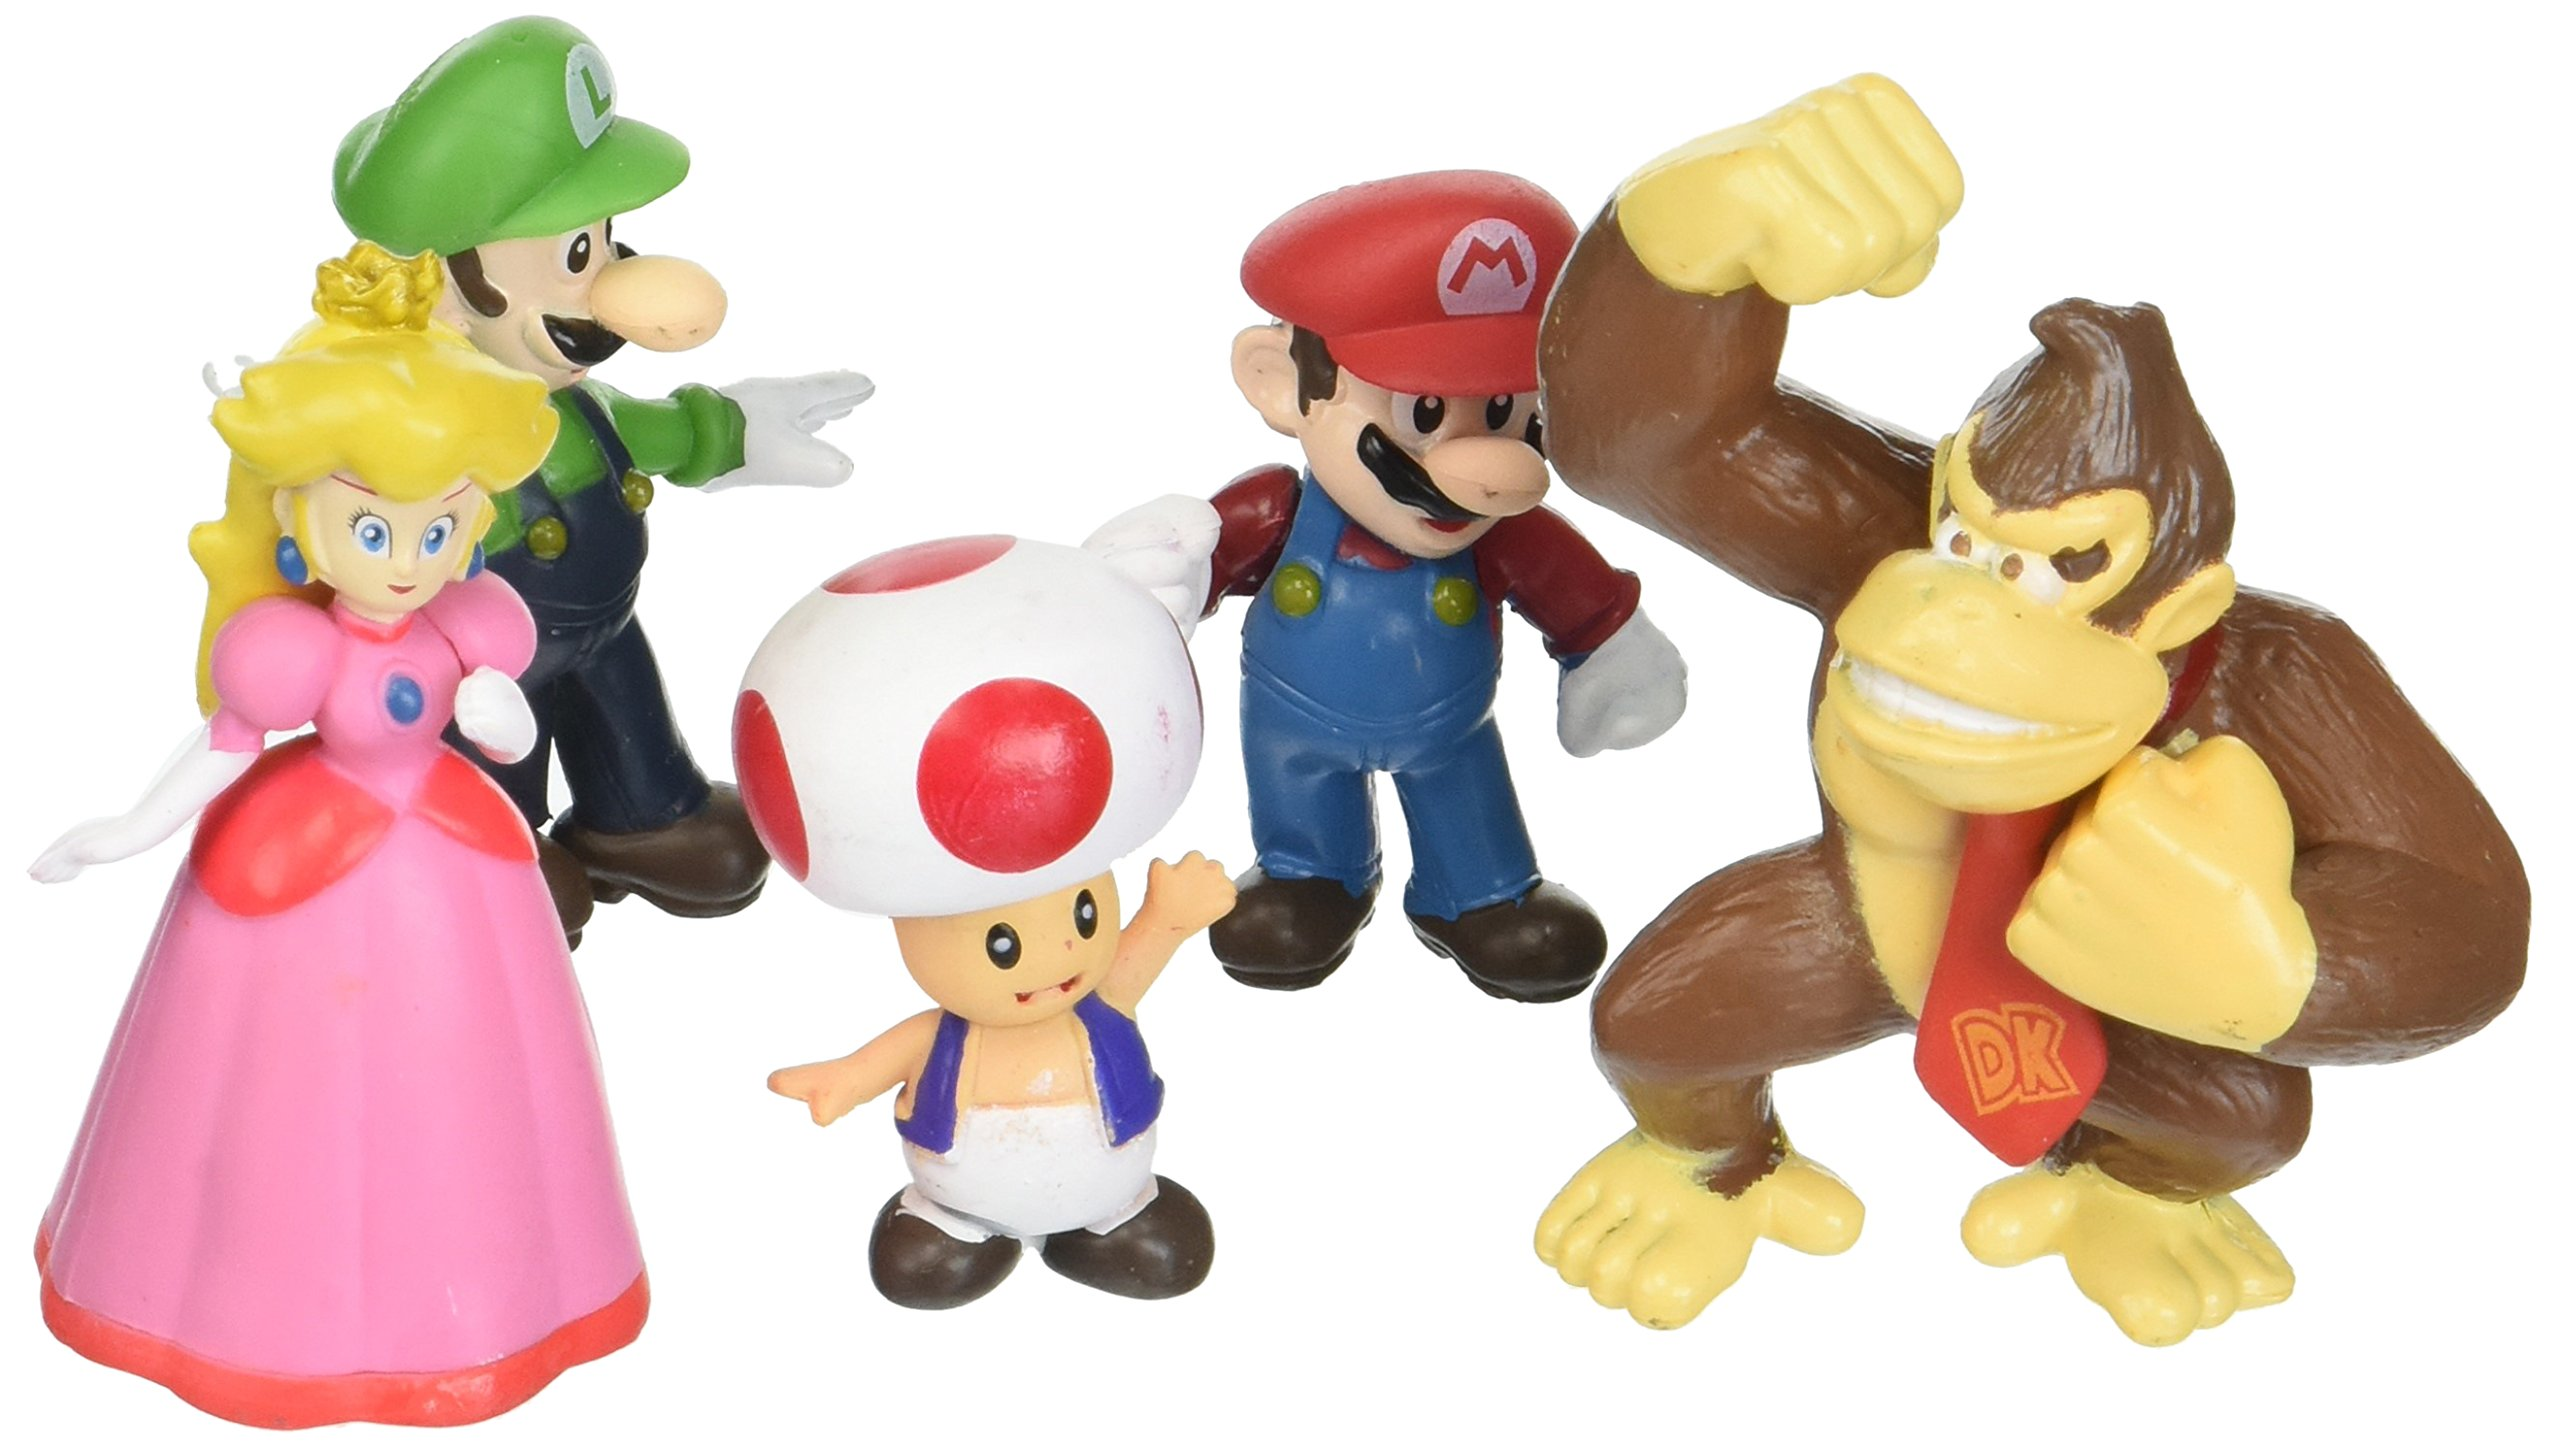 Generic Brothers Figures Set (18 Piece)